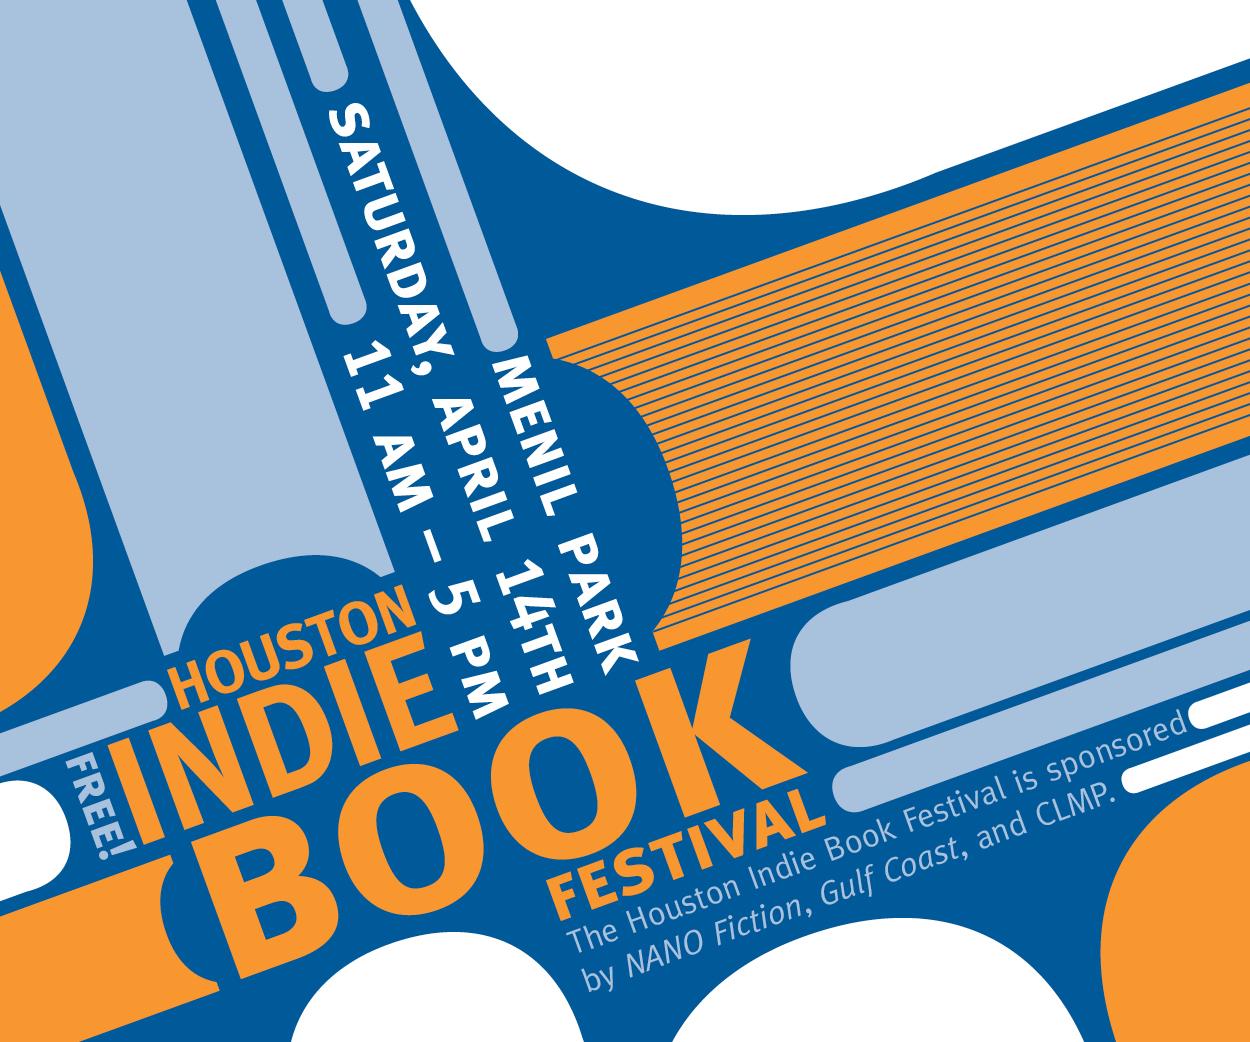 Houston Indie Book Festival 2012